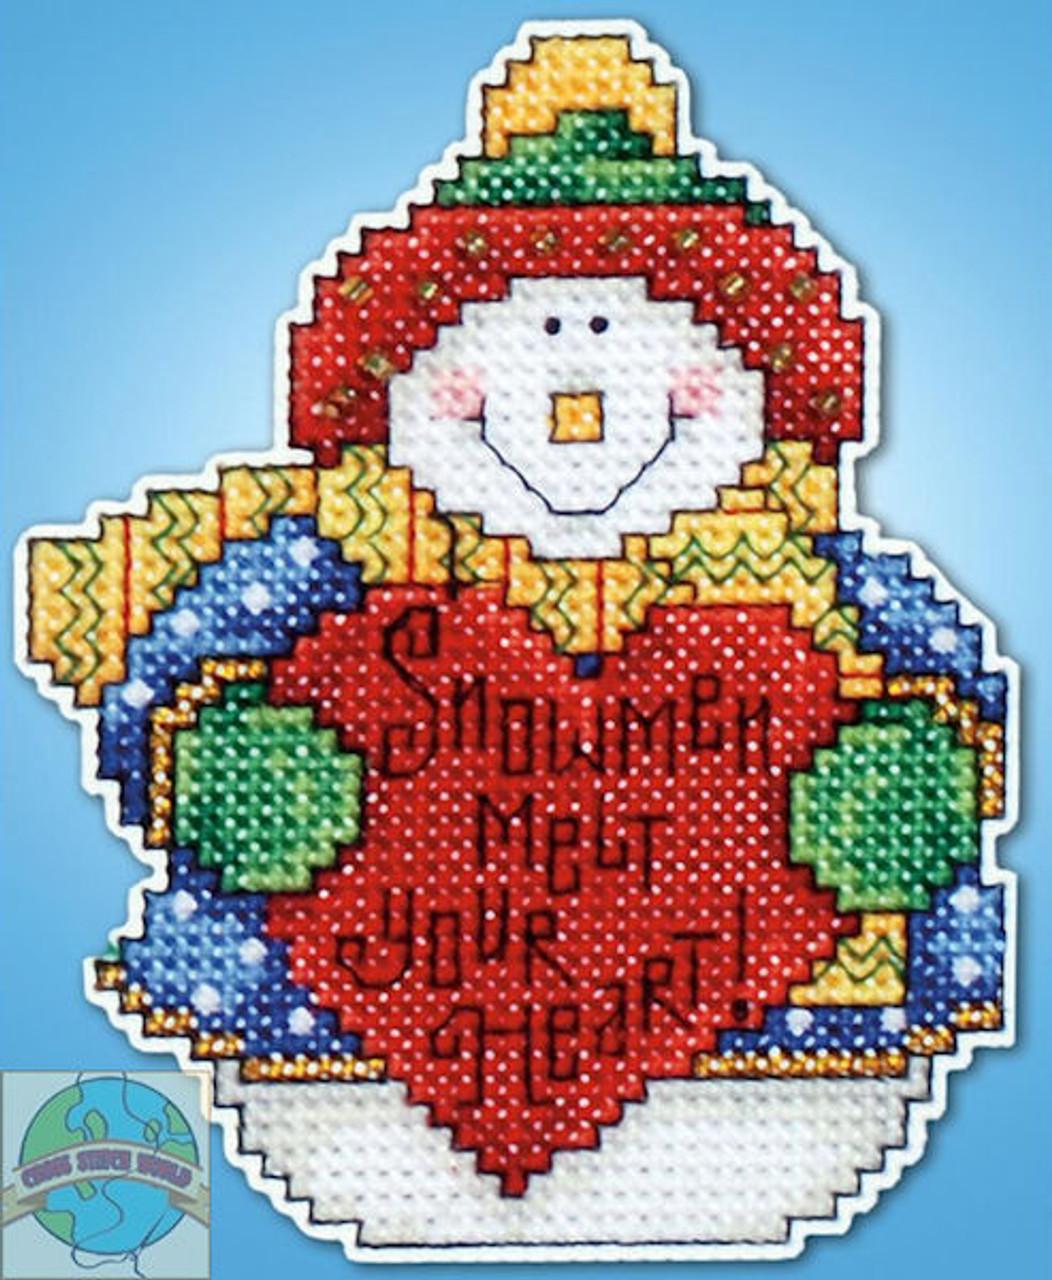 Design Works - Snowman Ornament